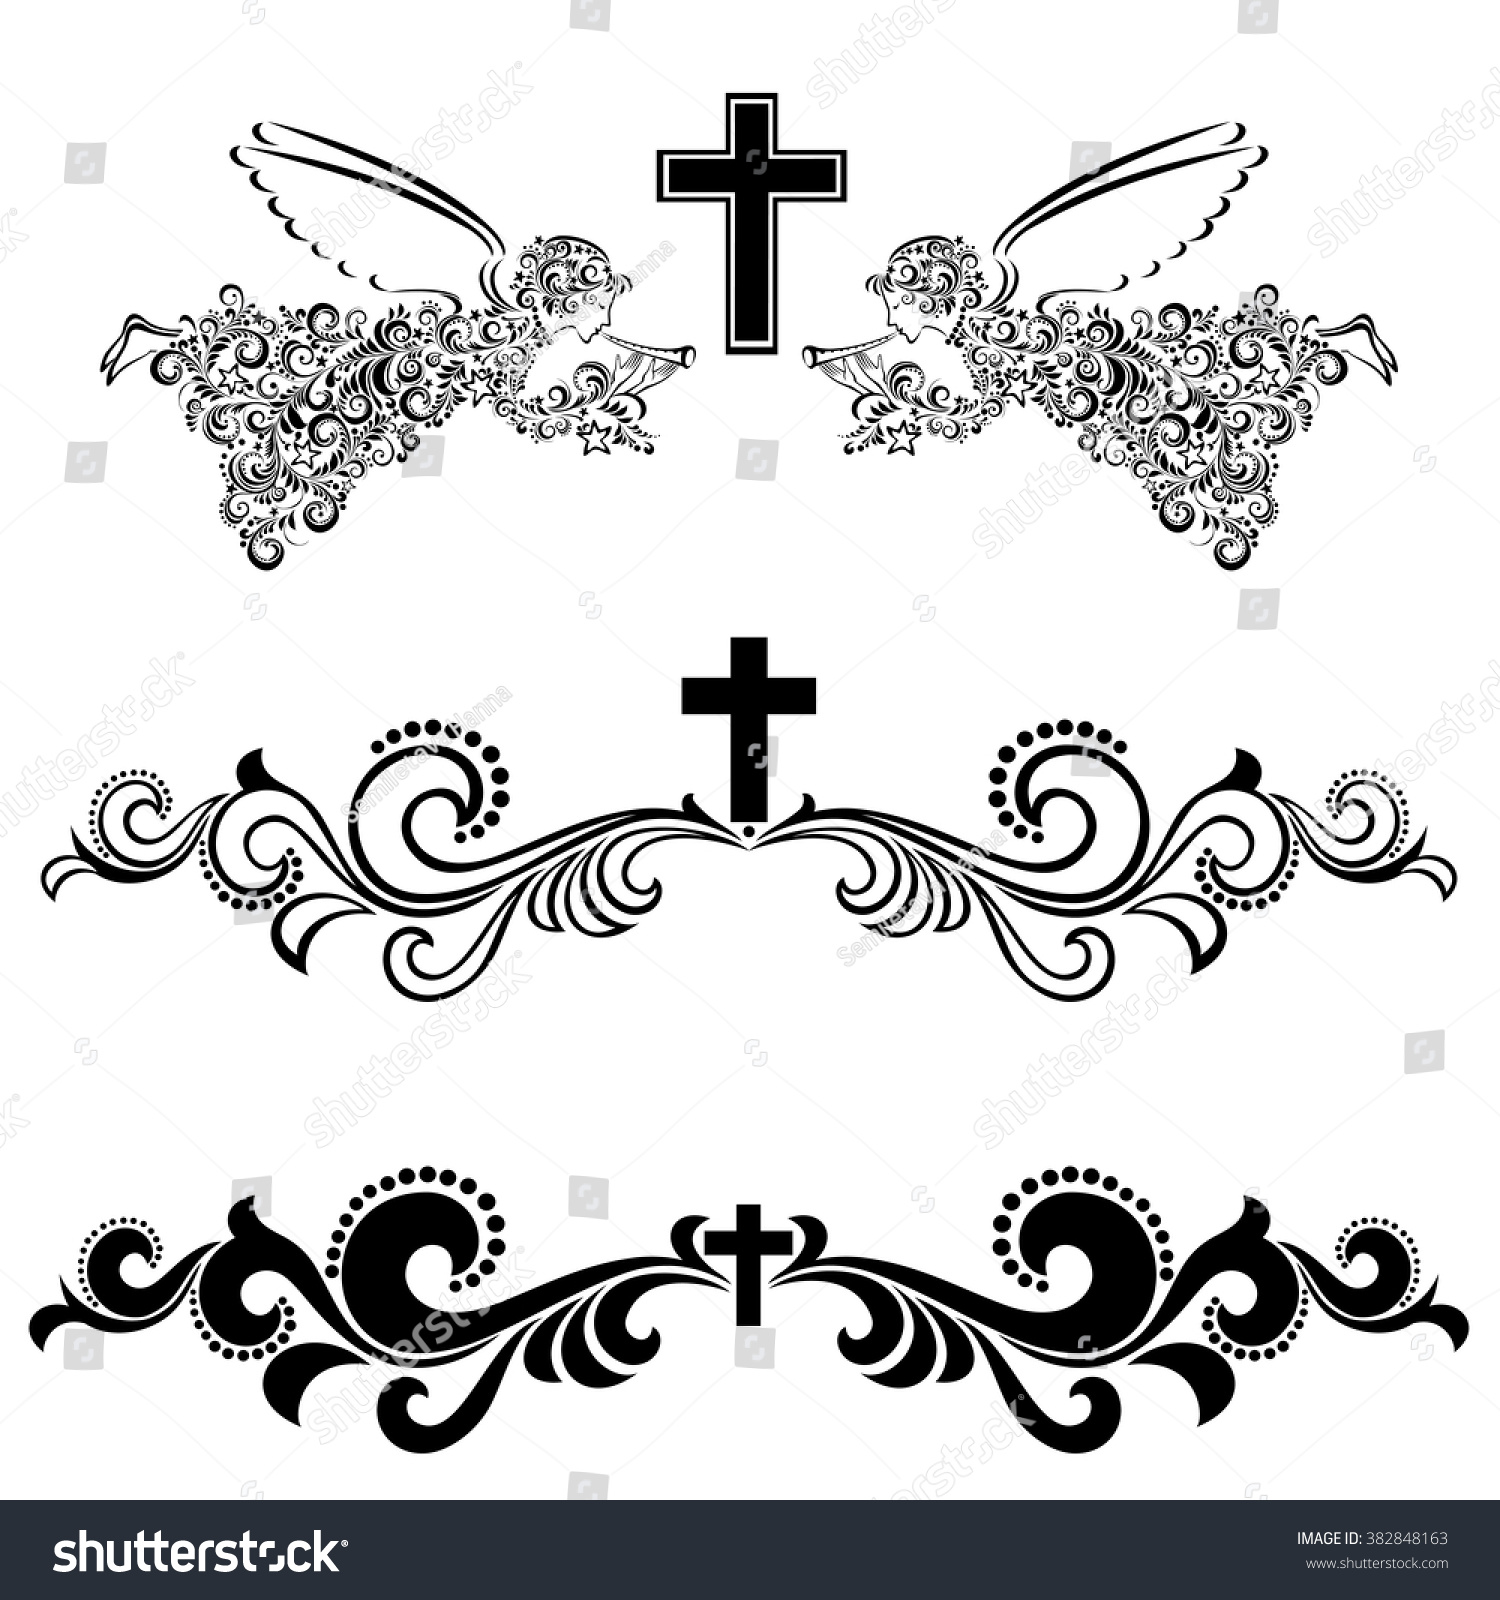 Christian Cross Borders And Frames